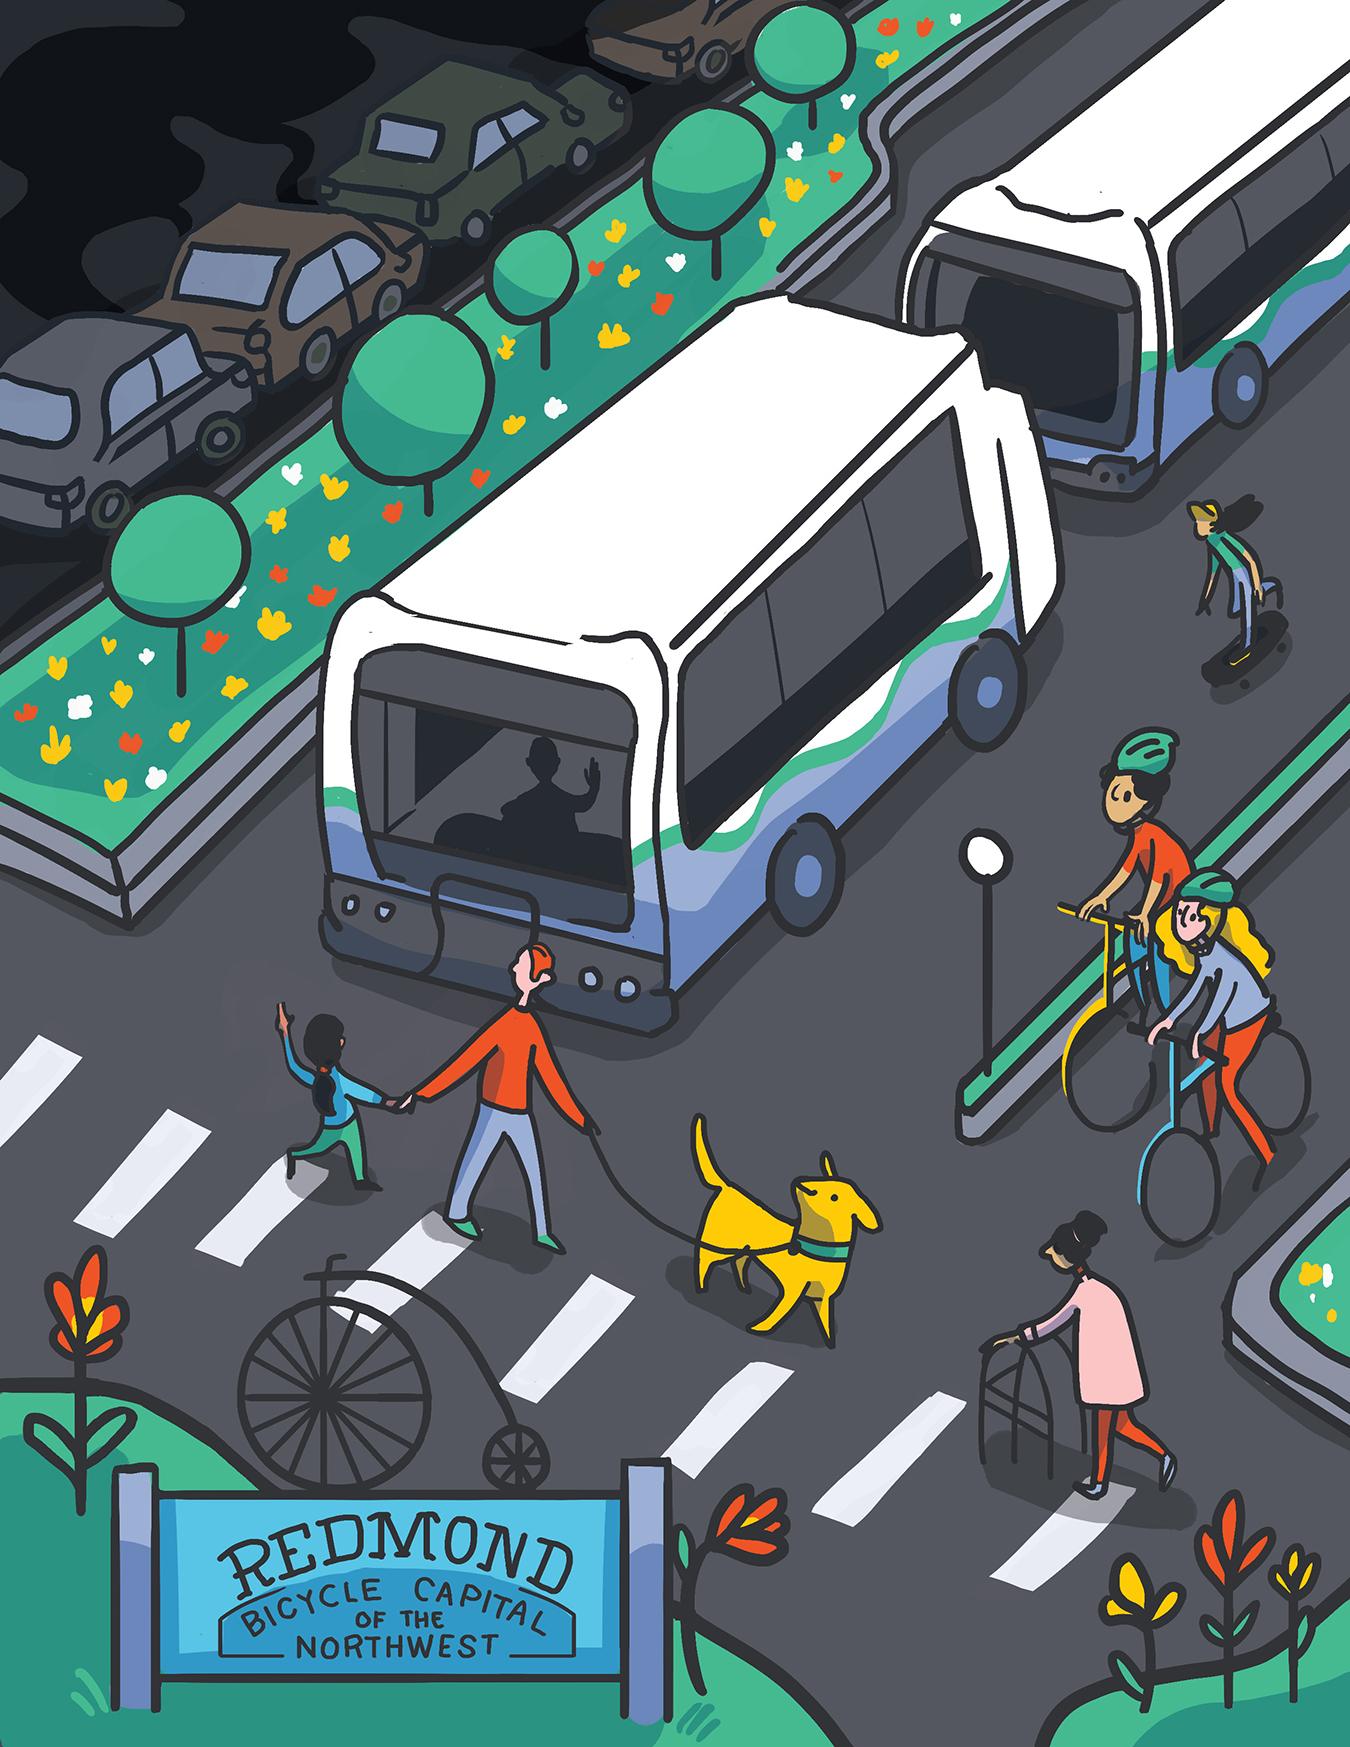 Illustration of public transit futures in Redmond, WA. People riding bikes, using crosswalks, and public transit.